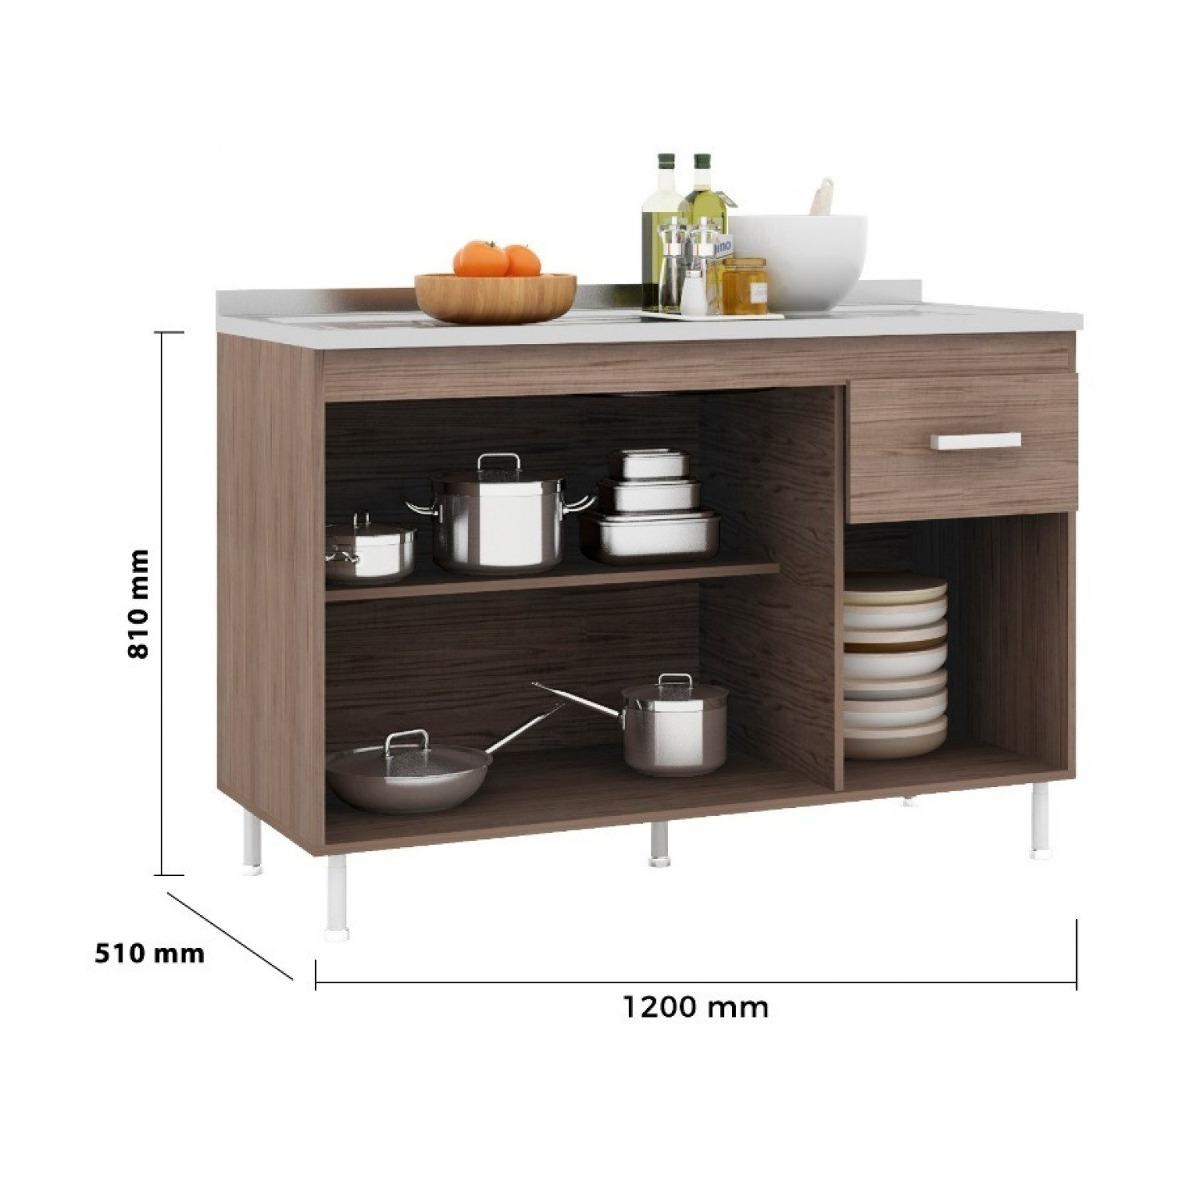 Cozinha Compacta Com Balc O It Lia Indekes N O Ehwt R 451 10 Em